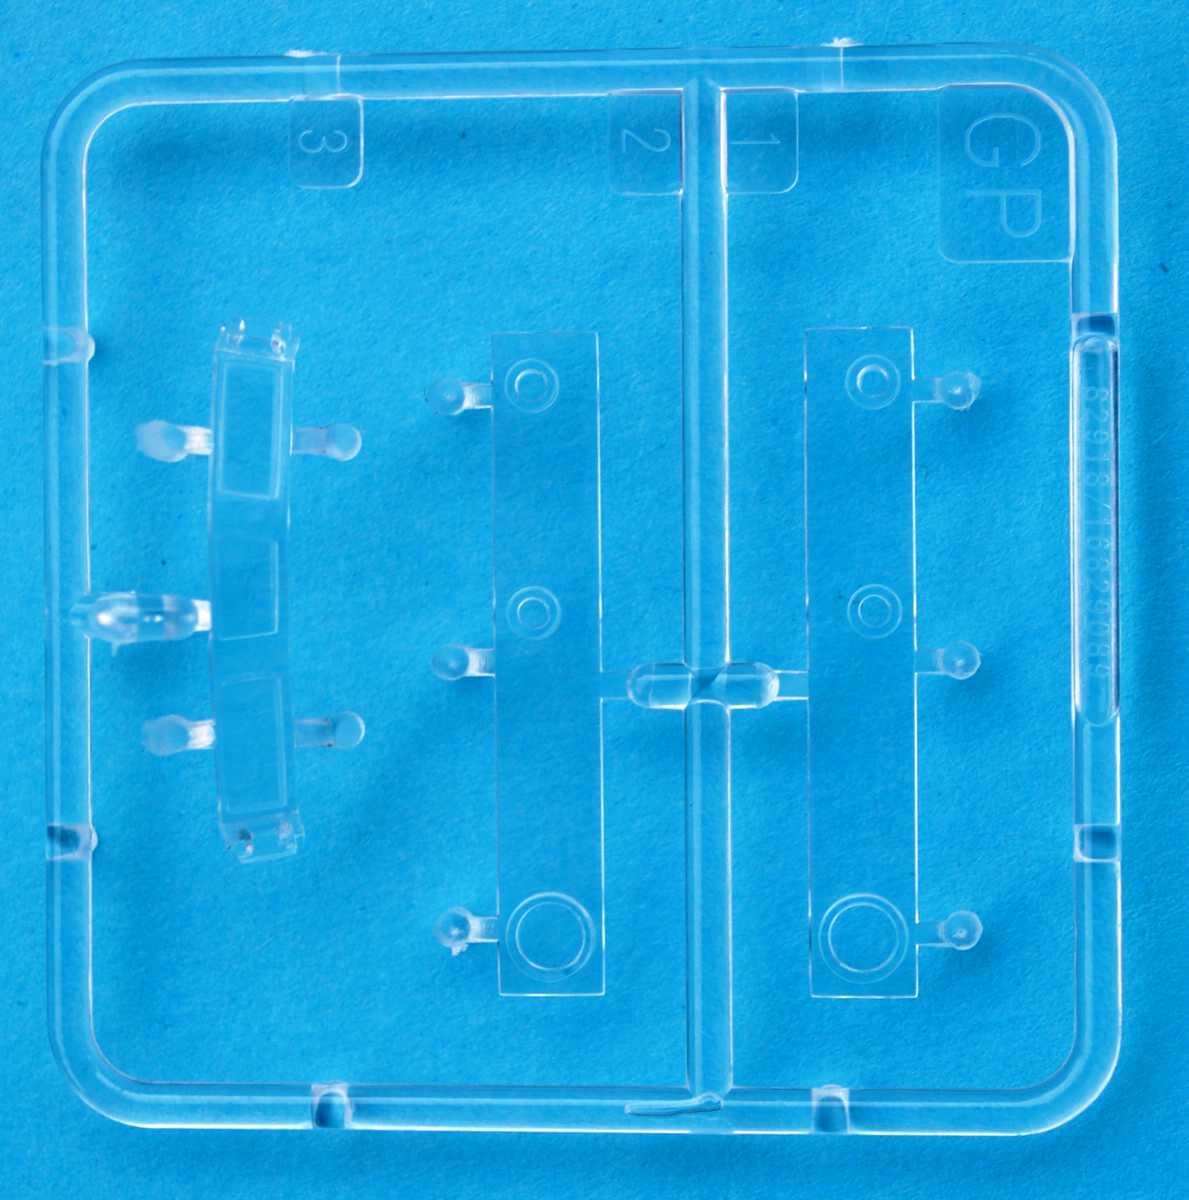 HobbyBoss-82918-Land-Wasser-Schlepper-12 Land Wasser Schlepper von Hobby Boss im Maßstab 1:72 # 82918